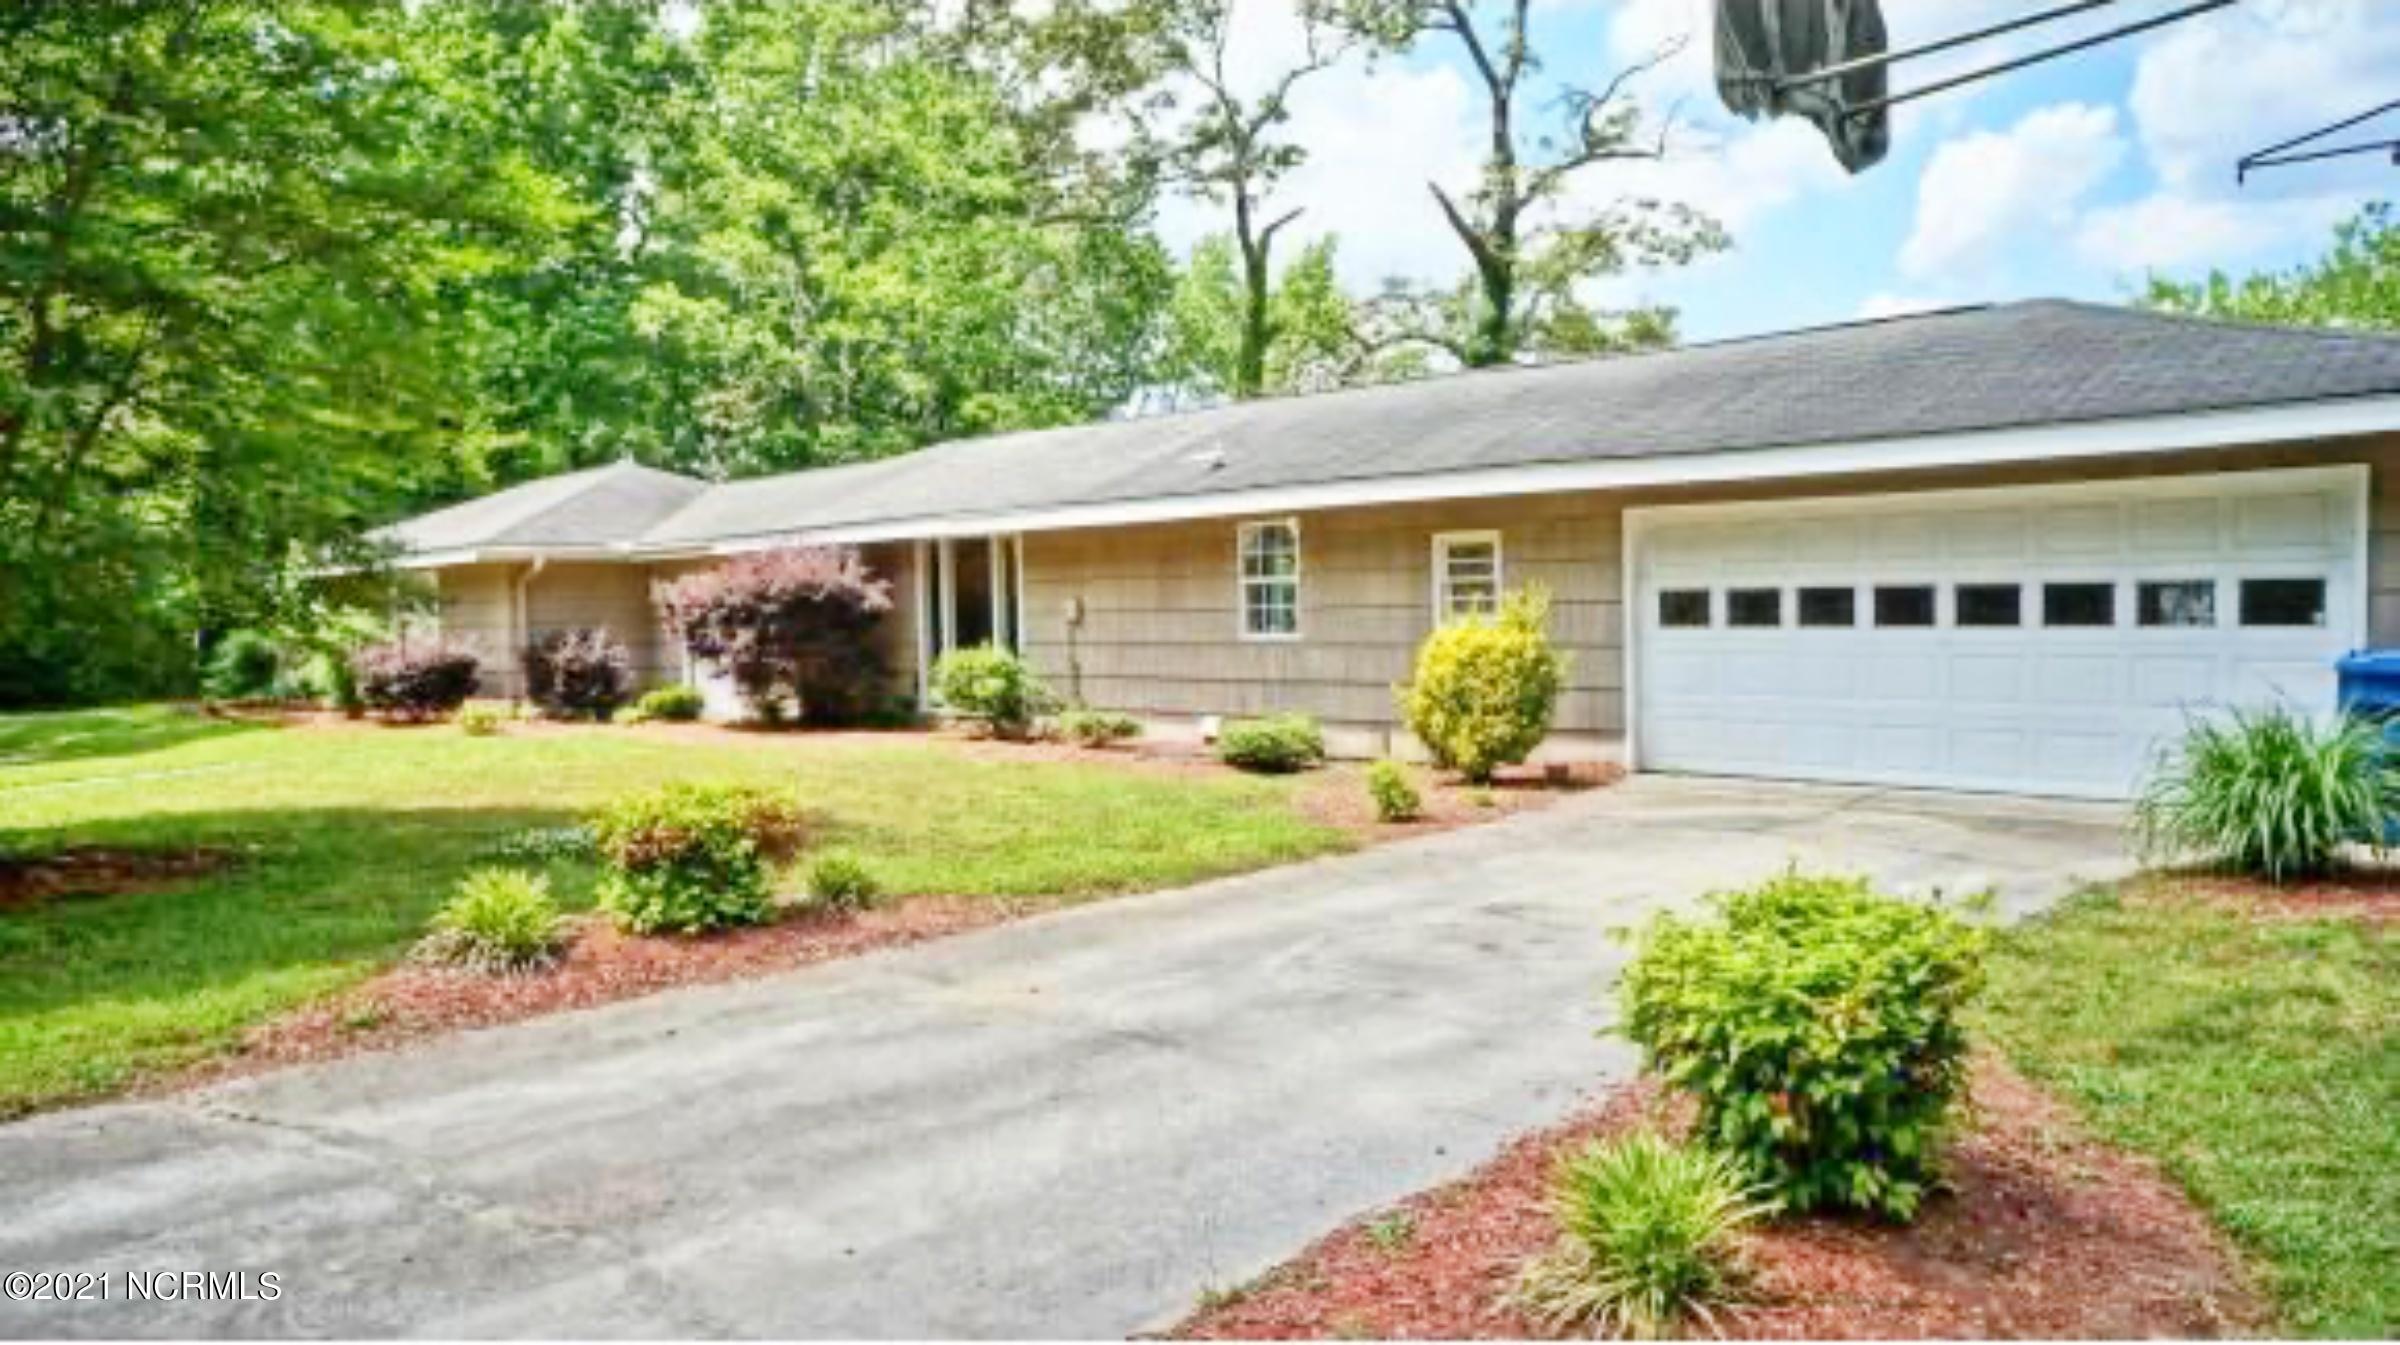 2331 Chinquapin Road, New Bern, North Carolina 28562, 2 Bedrooms Bedrooms, 9 Rooms Rooms,2 BathroomsBathrooms,Single family residence,For sale,Chinquapin,100227985